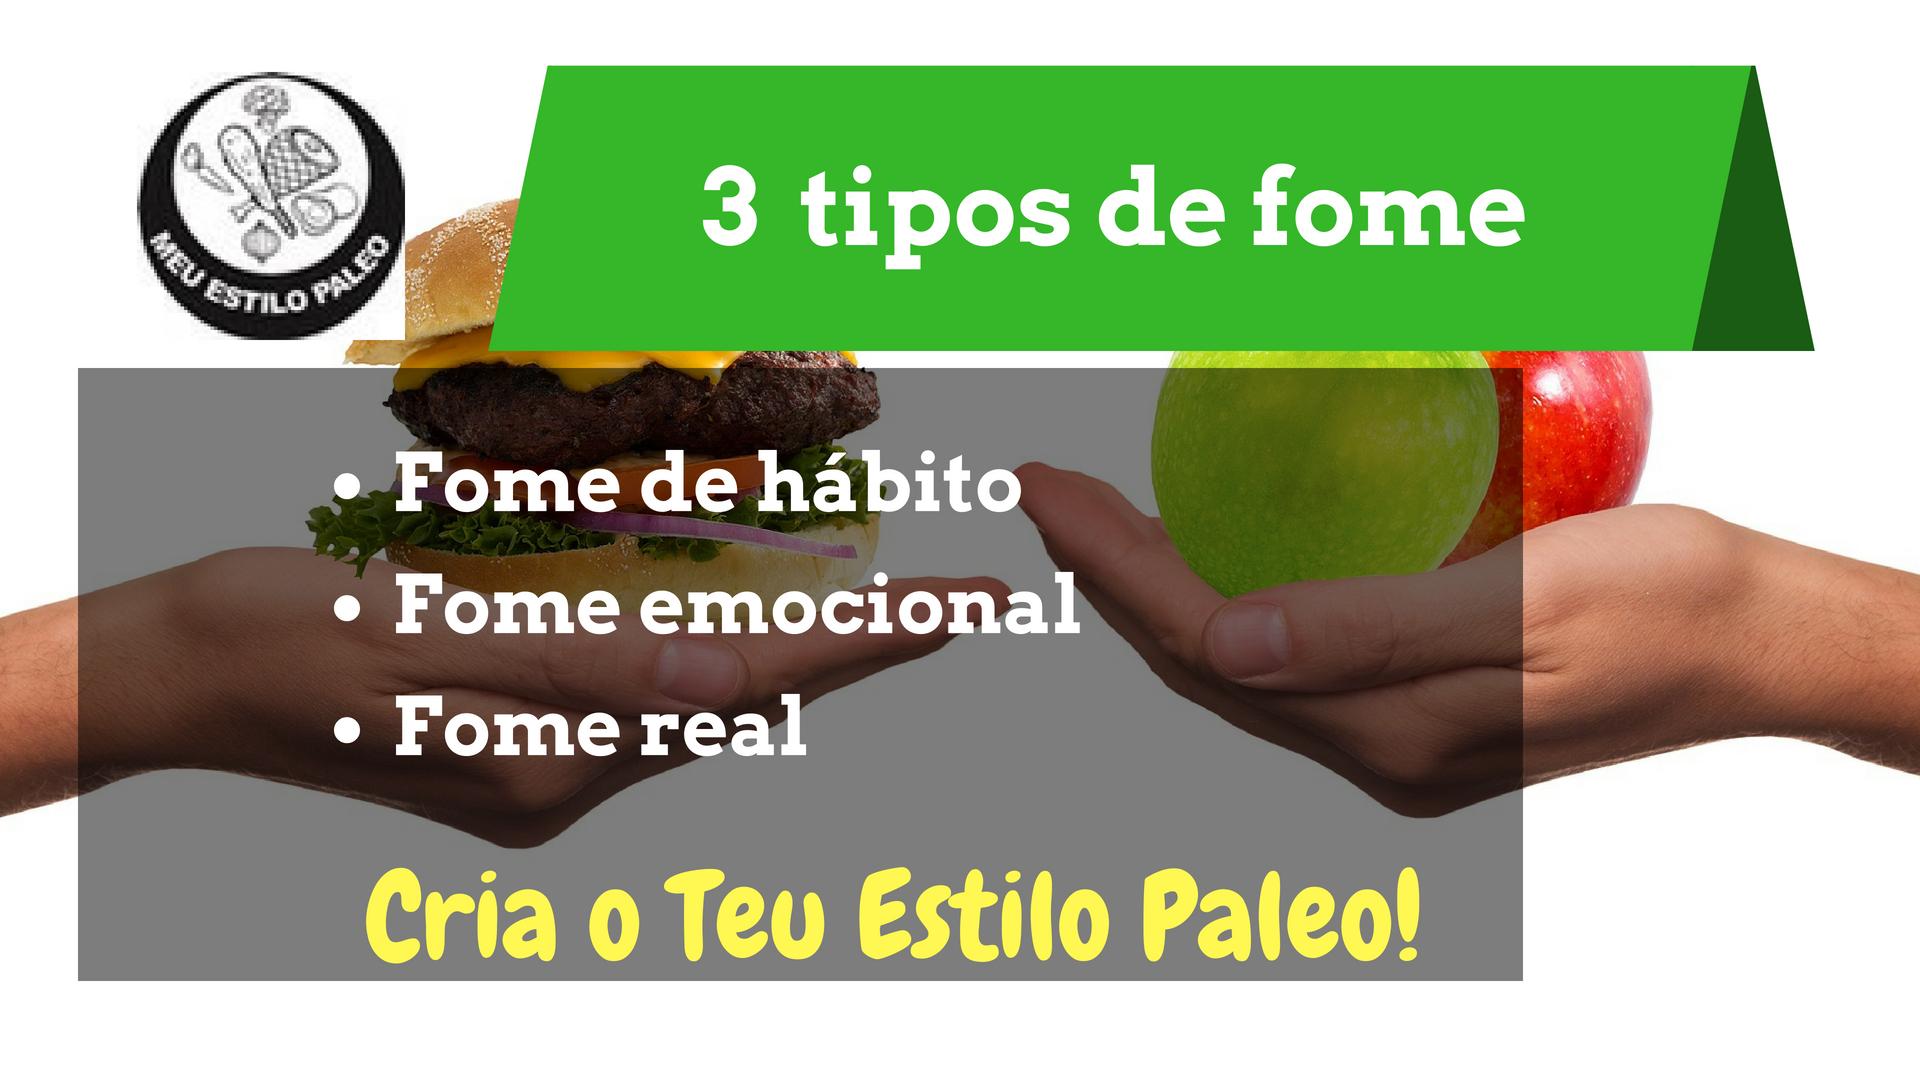 Conhece os 3 tipos de fome e descobre a tua